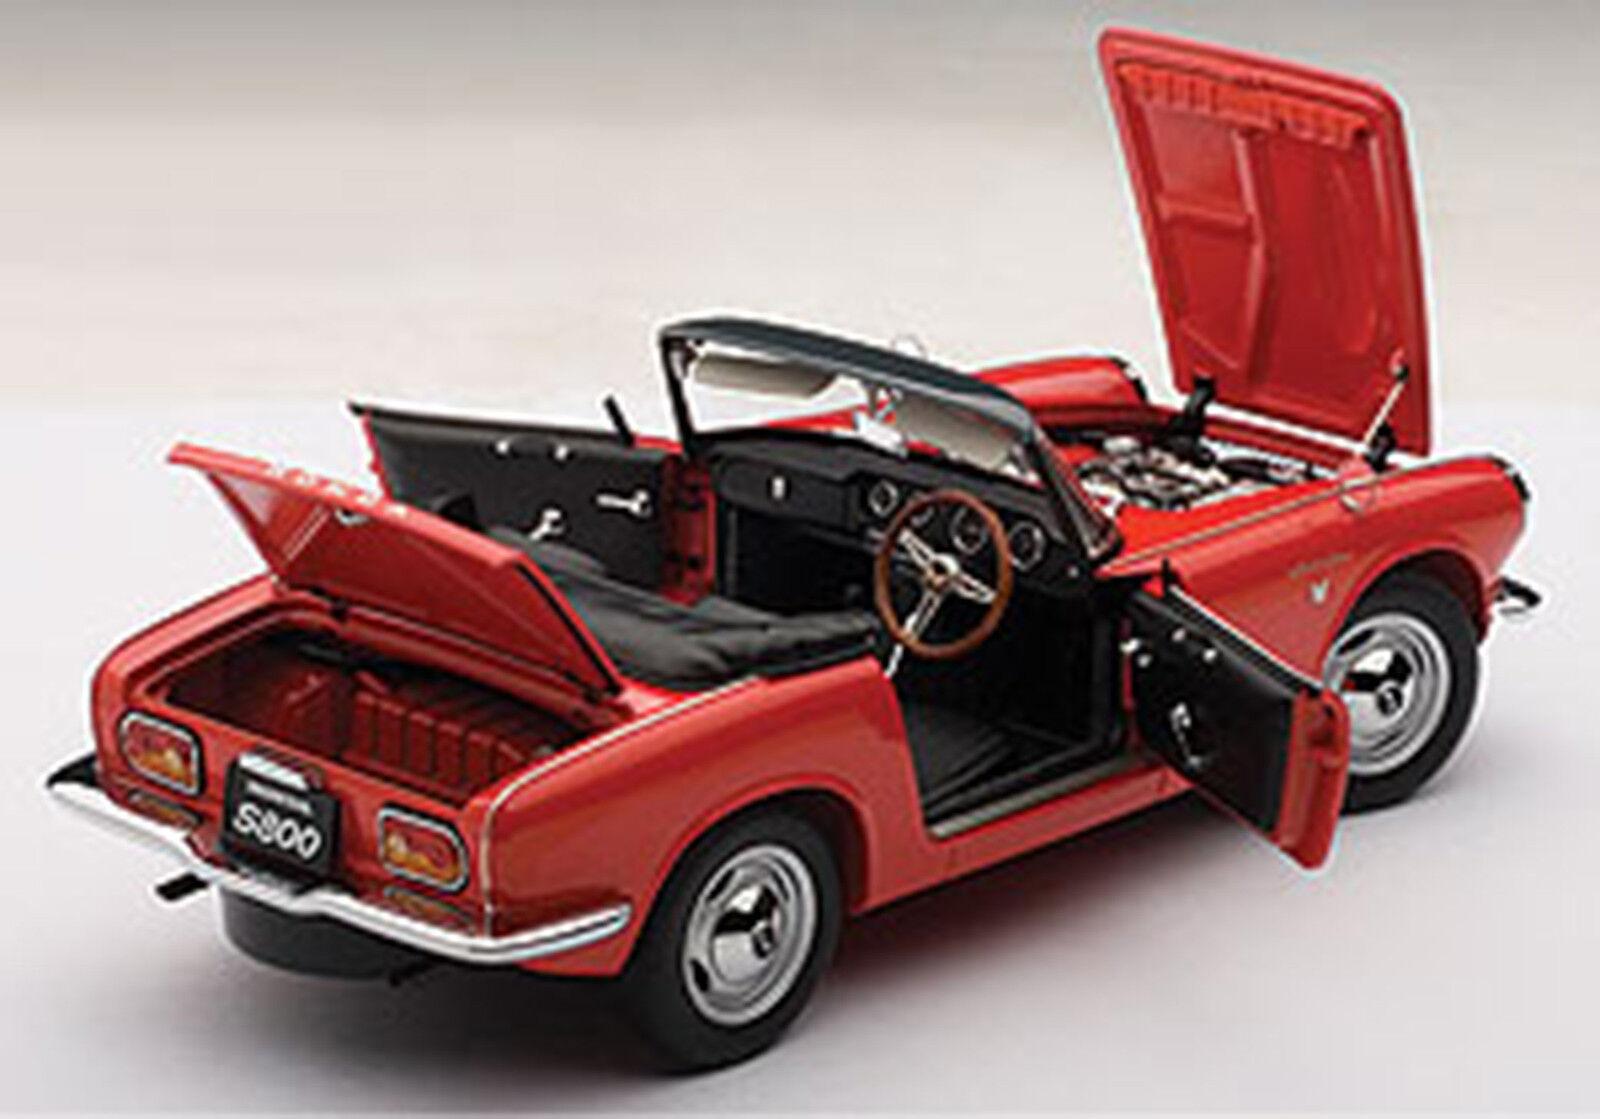 Autoart honda s800 roadster 1966 rot 1   18 - skala.neue version